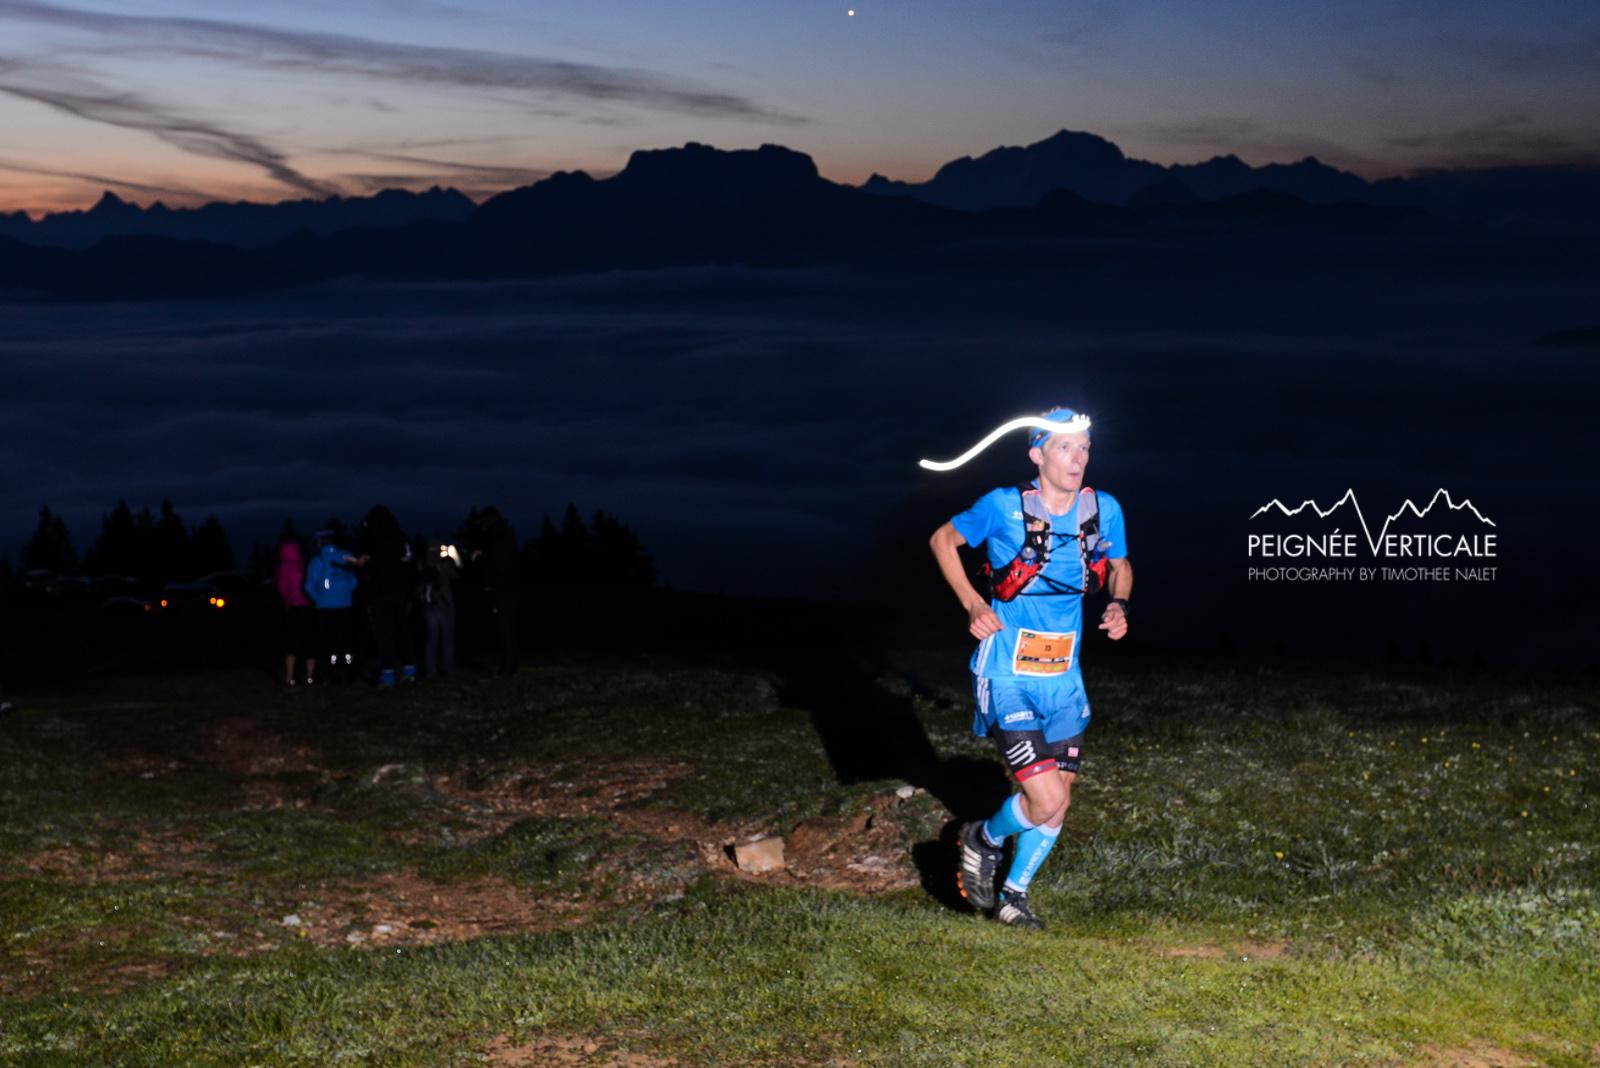 MaxiRace-Annecy-2014-Team-Hoka-Timothee-Nalet-0690.jpg